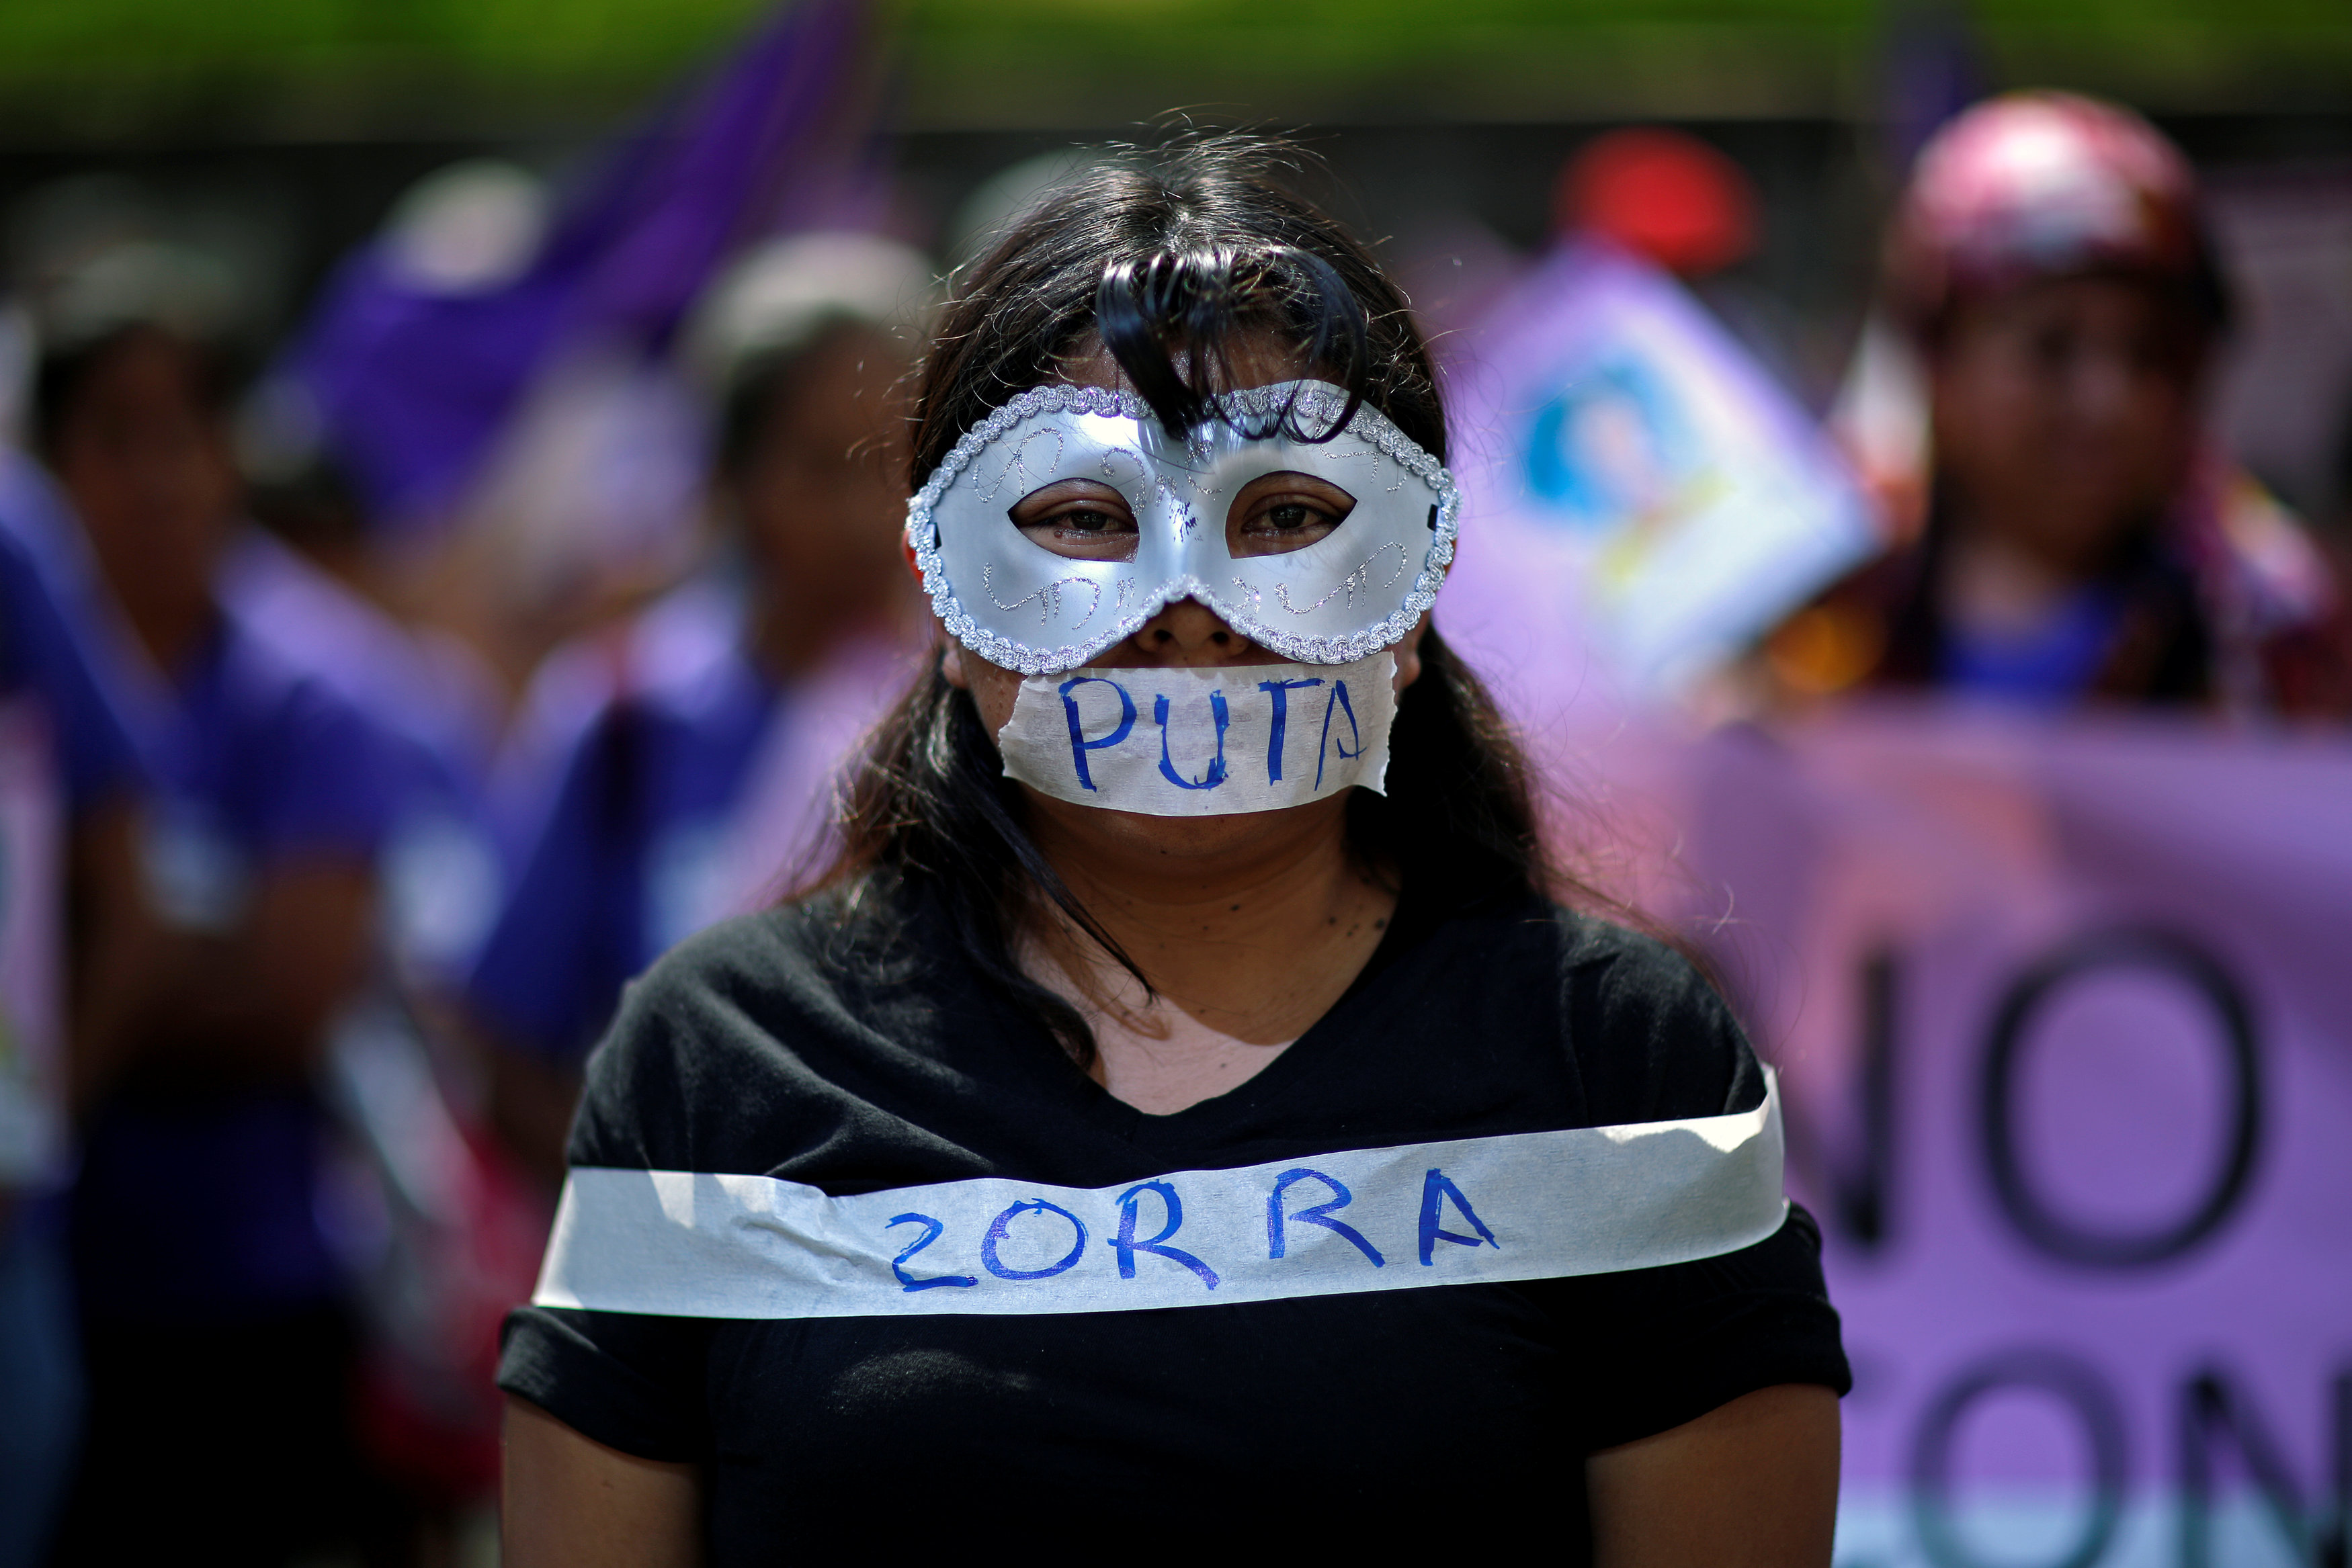 mujeres-proteta-machismo-violencia-feminicidios-transfobia